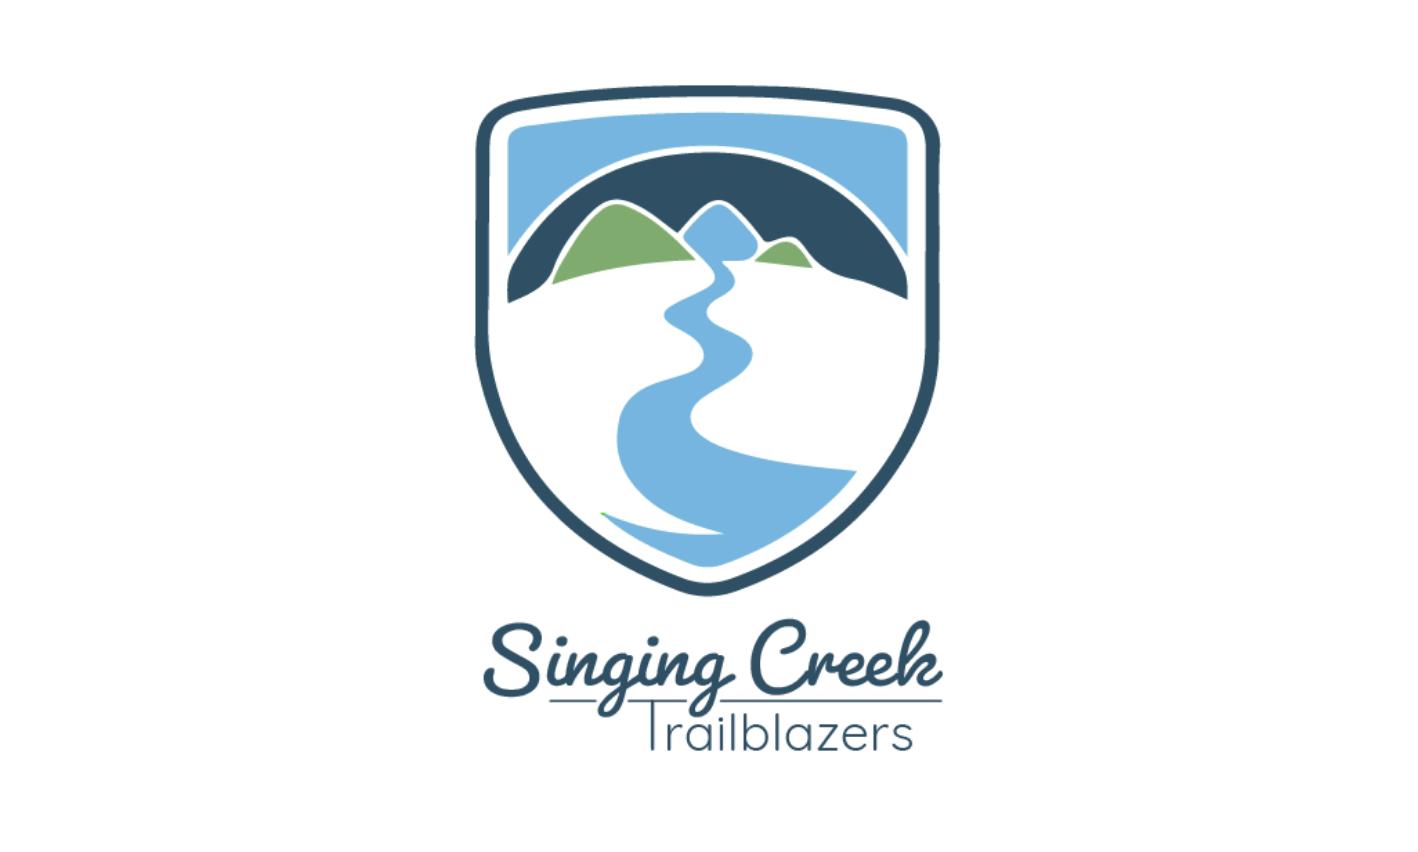 Client: Singing Creek Trailblazers